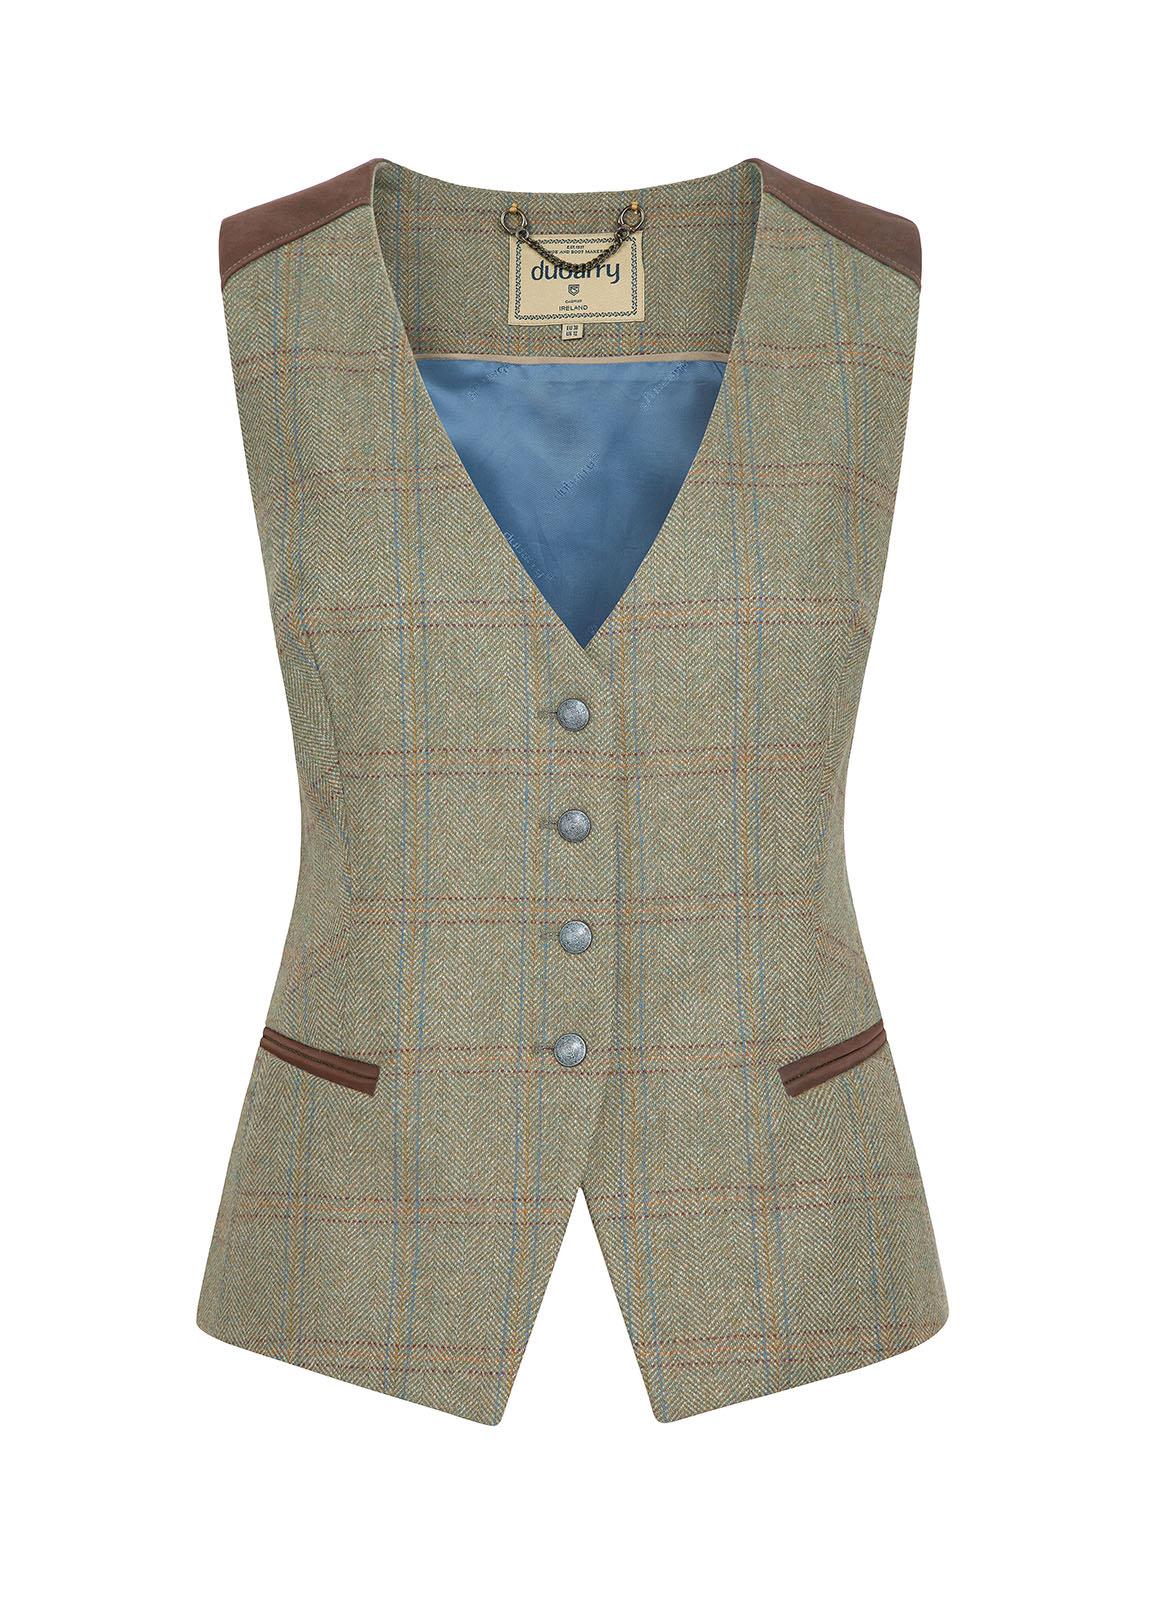 Dubarry_ Daisy Fitted Tweed Waistcoat - Acorn_Image_2